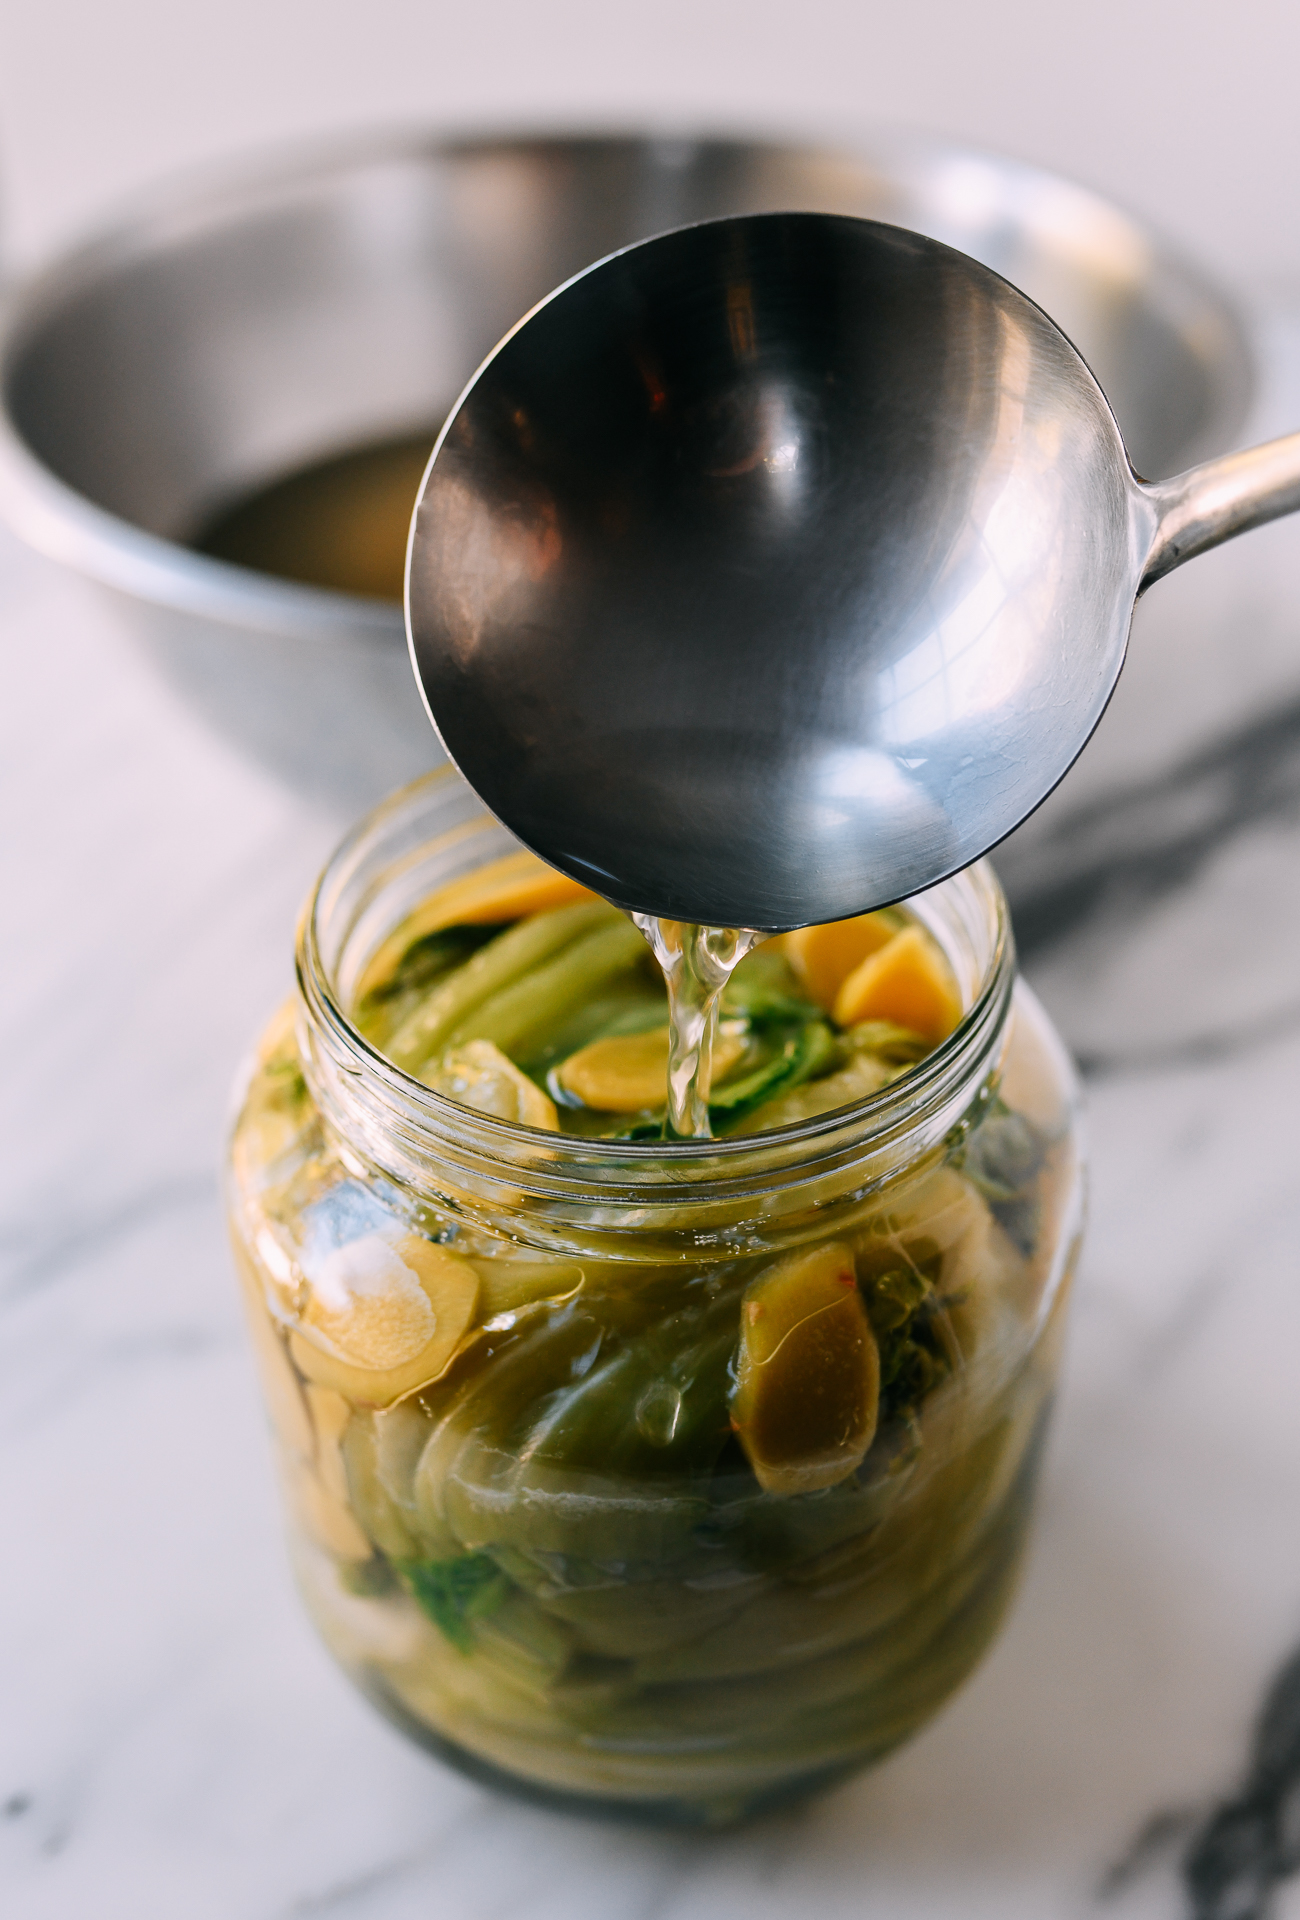 Adding brine to jar of mustard greens